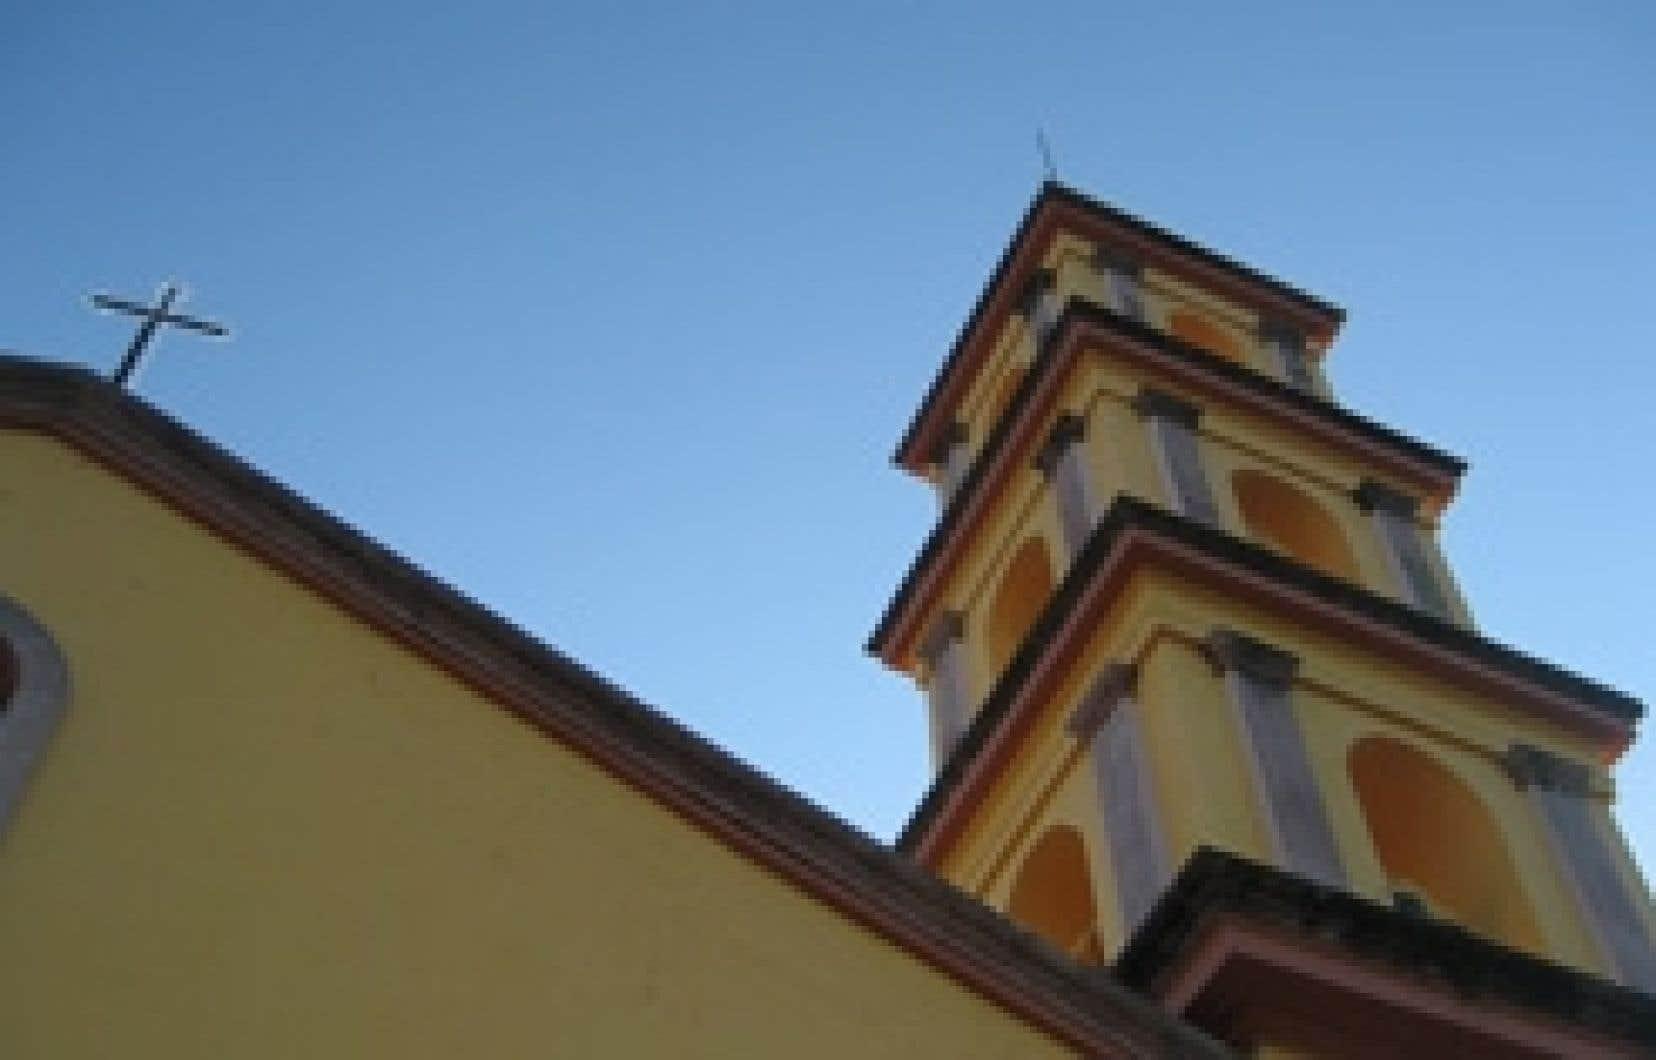 Le clocher du temple de San Martin Caballero de la ville de San Martin Chalchicuatla, situé dans la Huasteca Potosina.